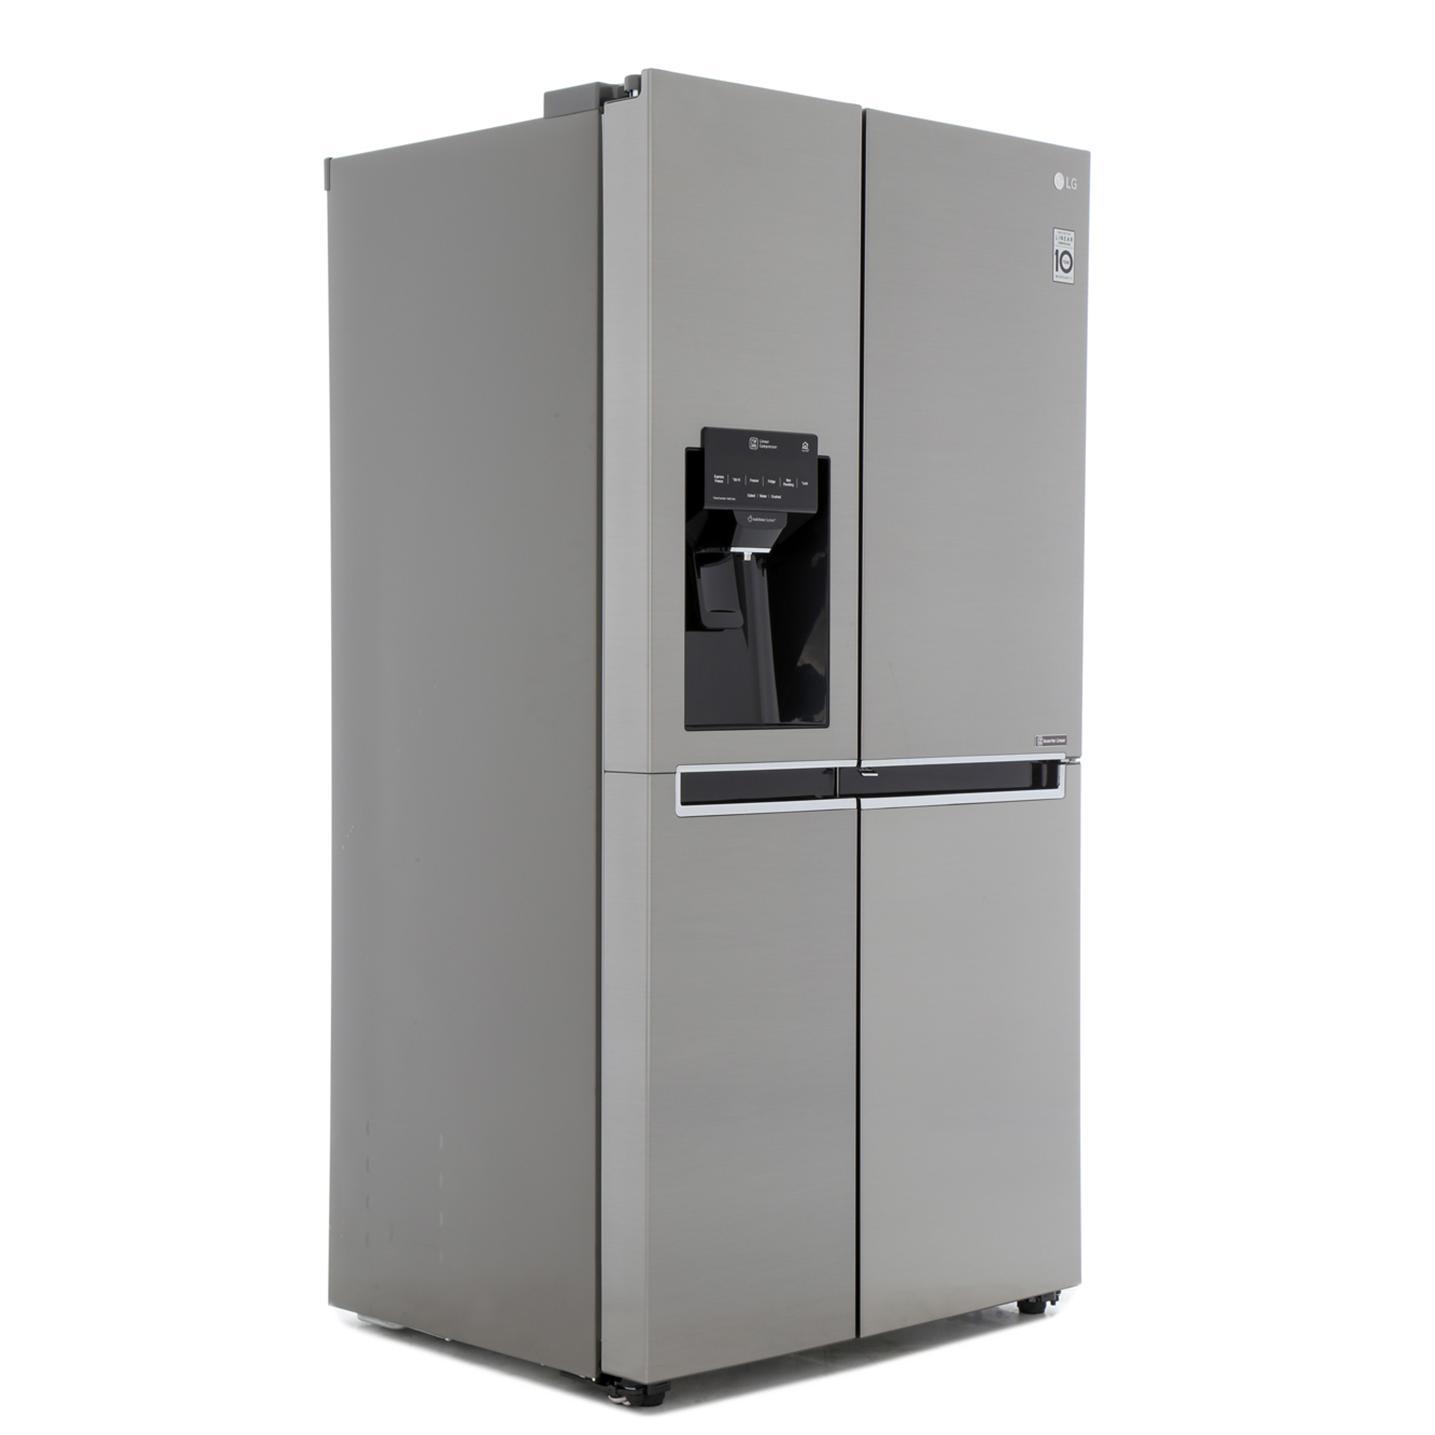 LG GSJ761PZXV American Fridge Freezer